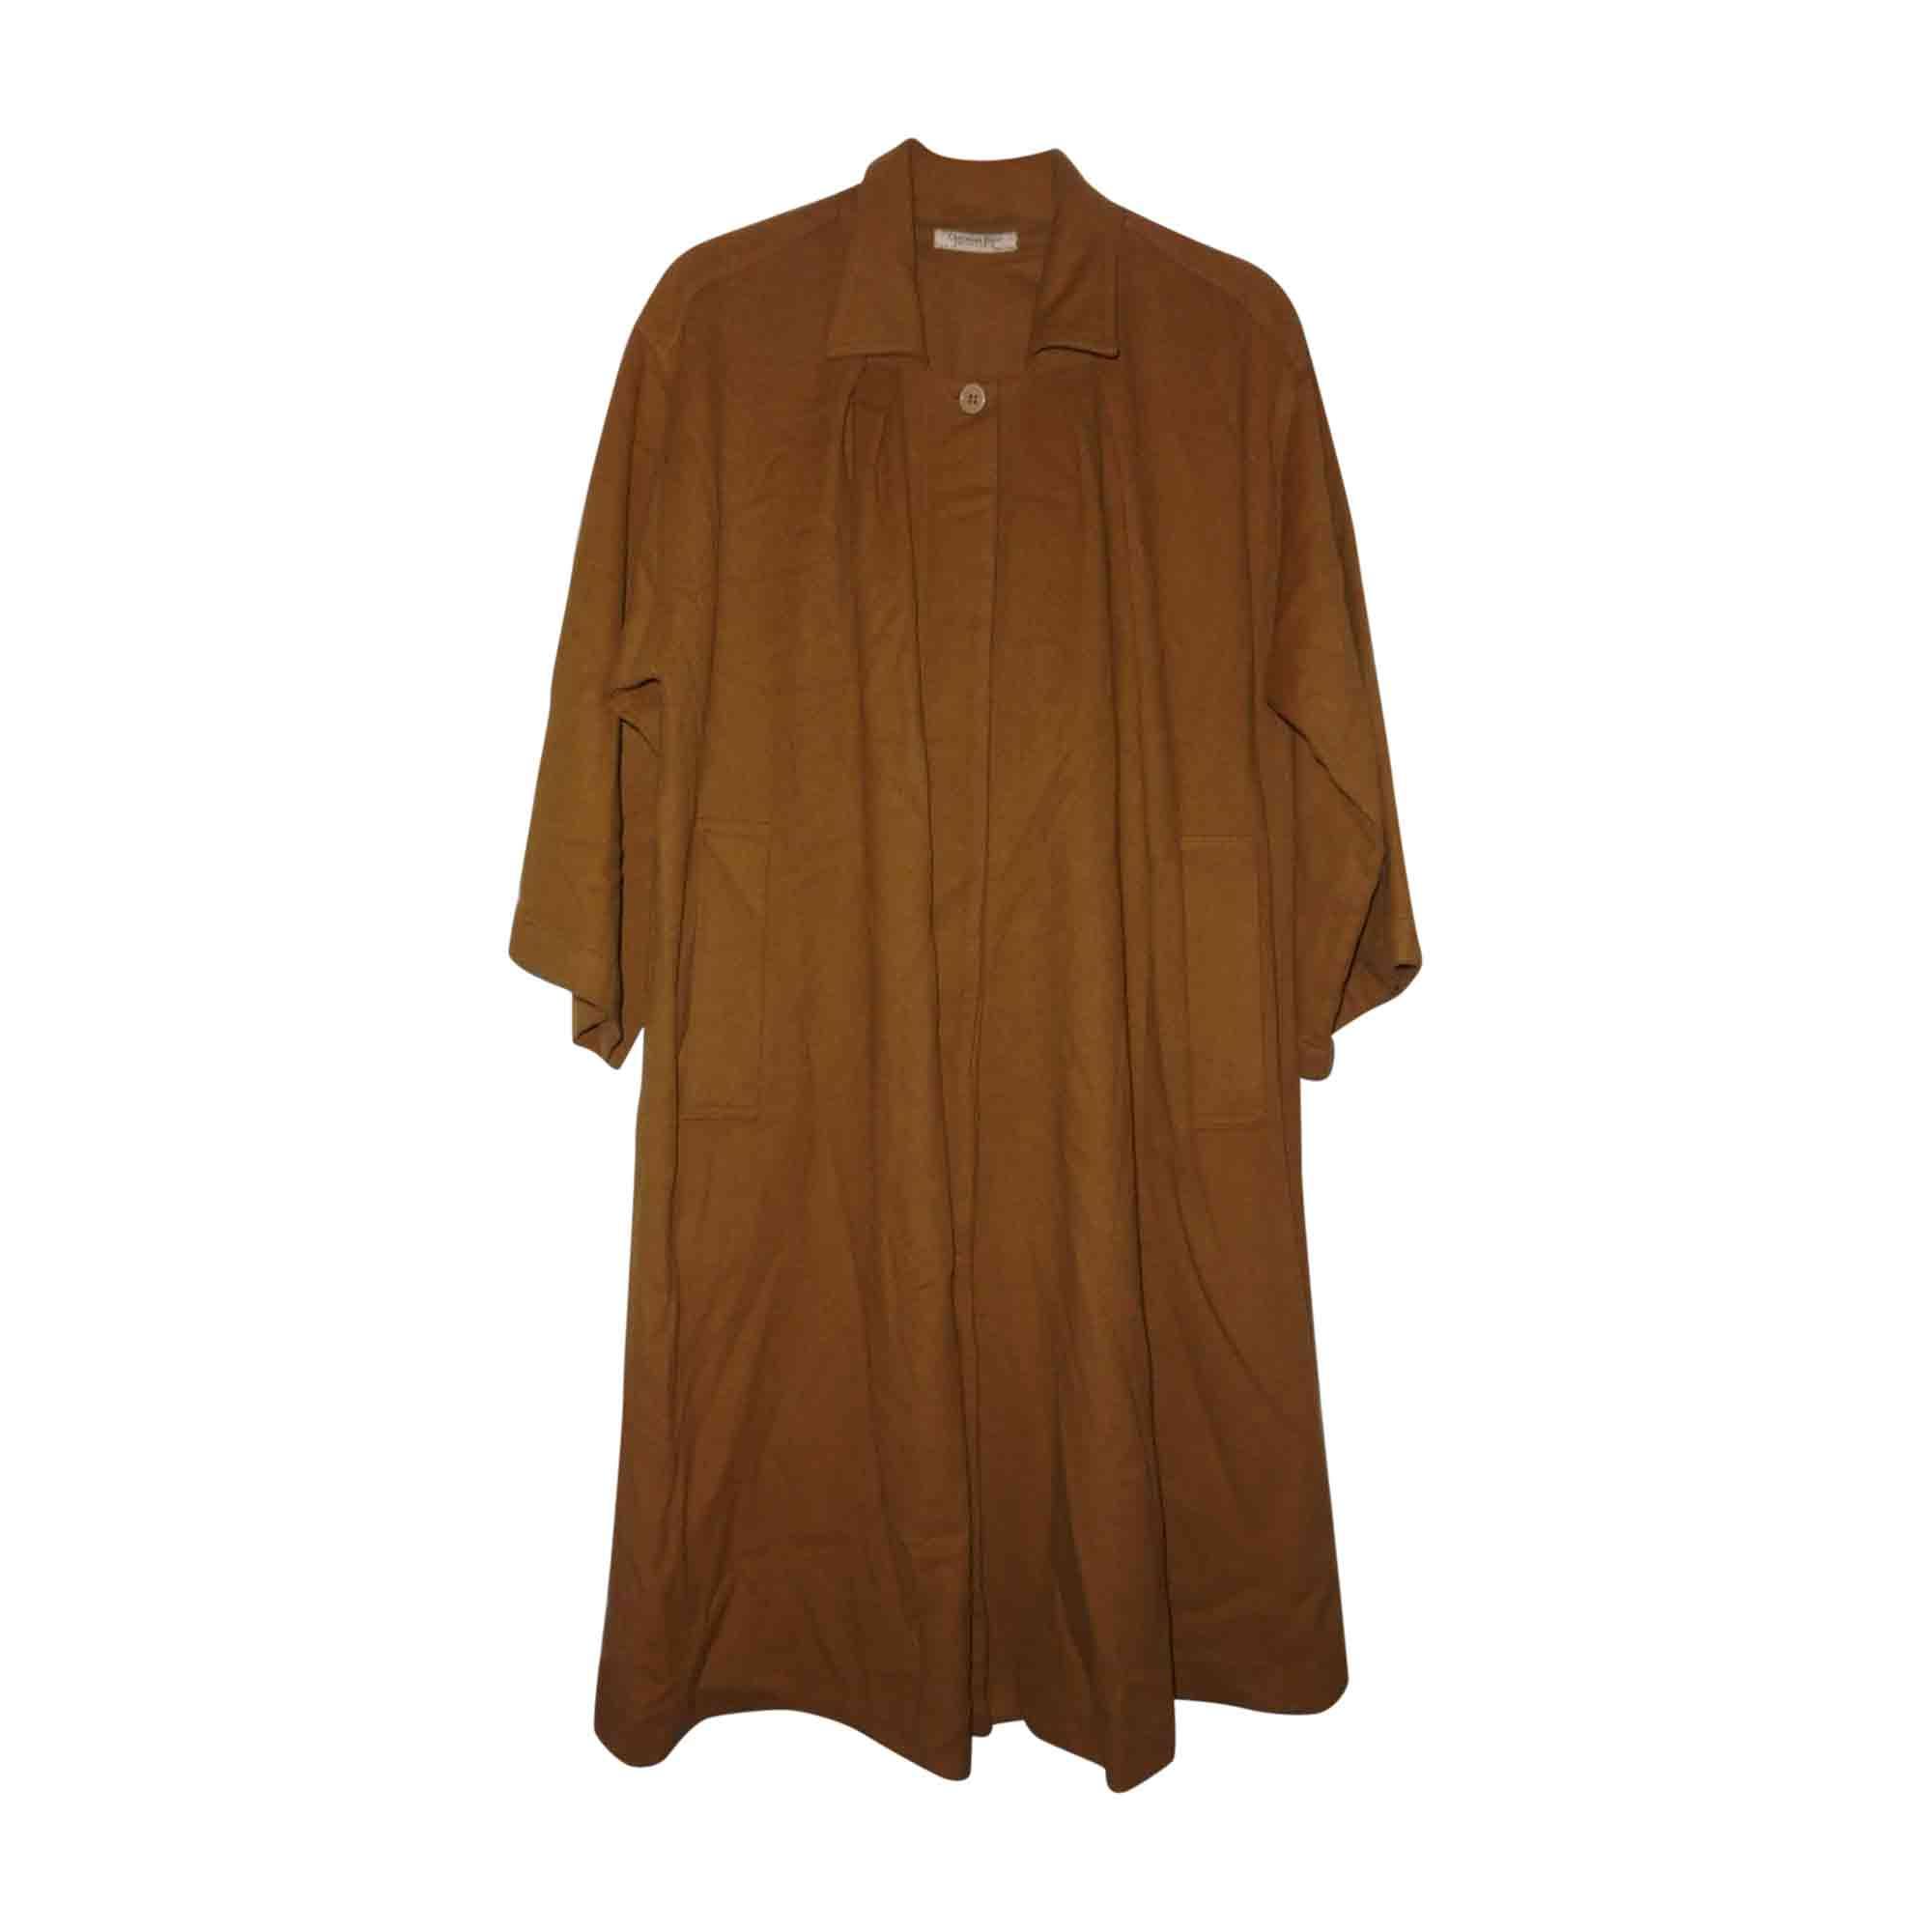 Manteau DIOR Beige, camel